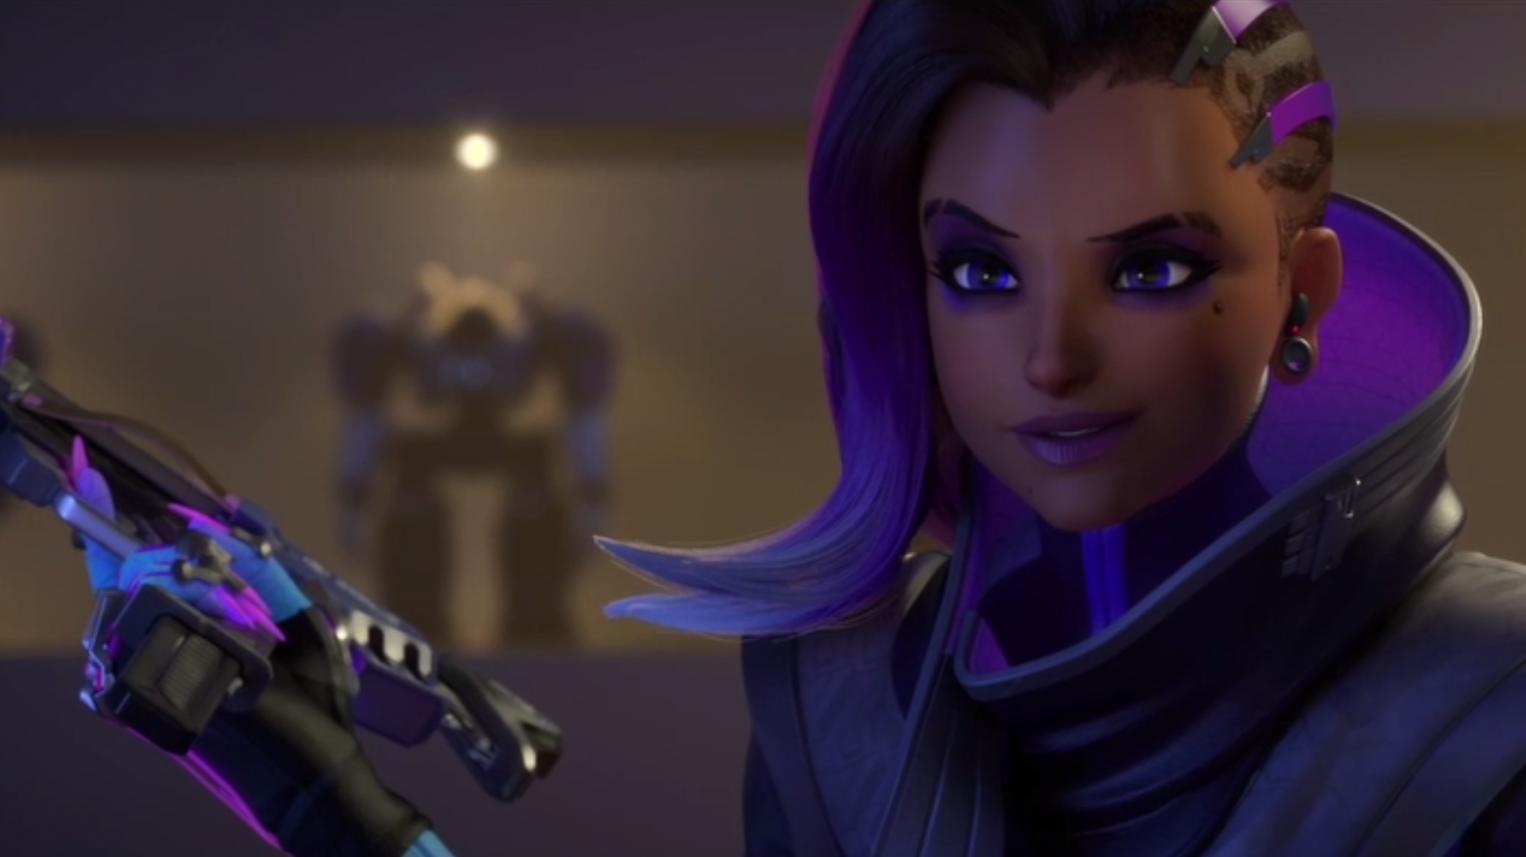 Vega appeared as Overwatch criminal hacker Sombra.